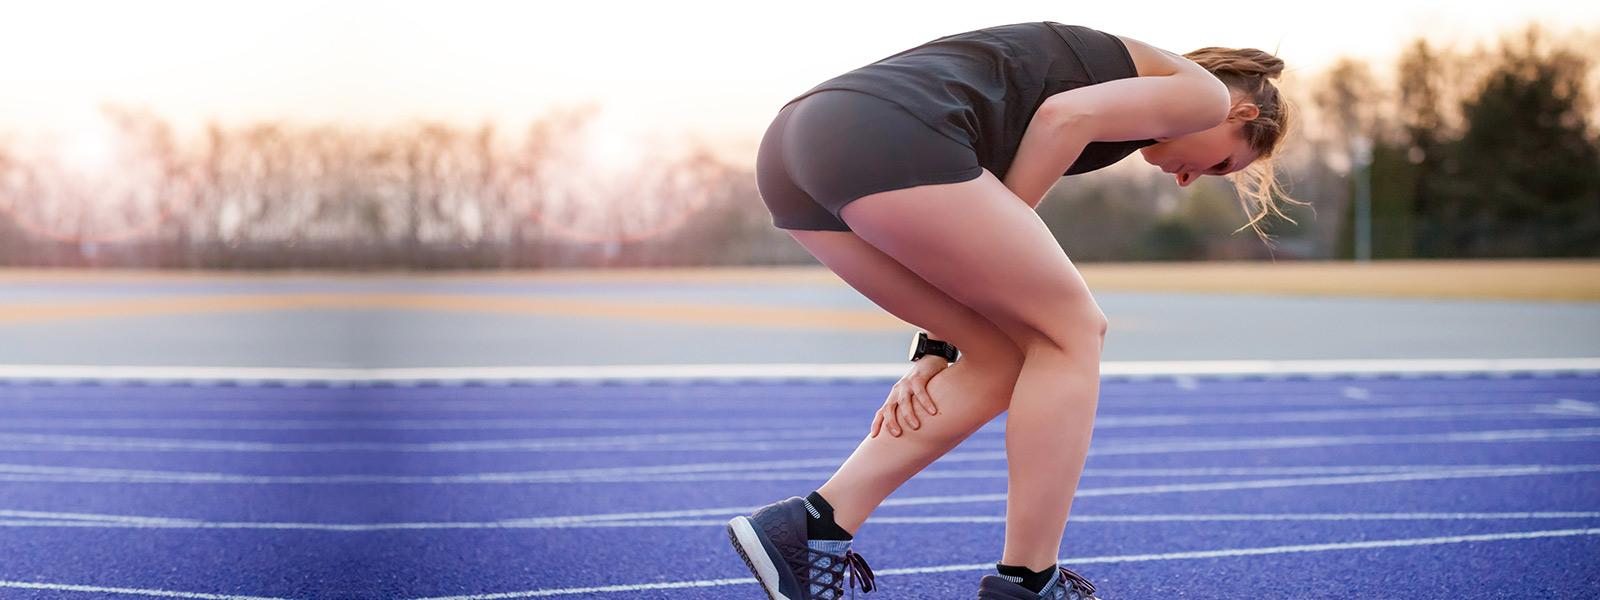 dublin sports injury clinic